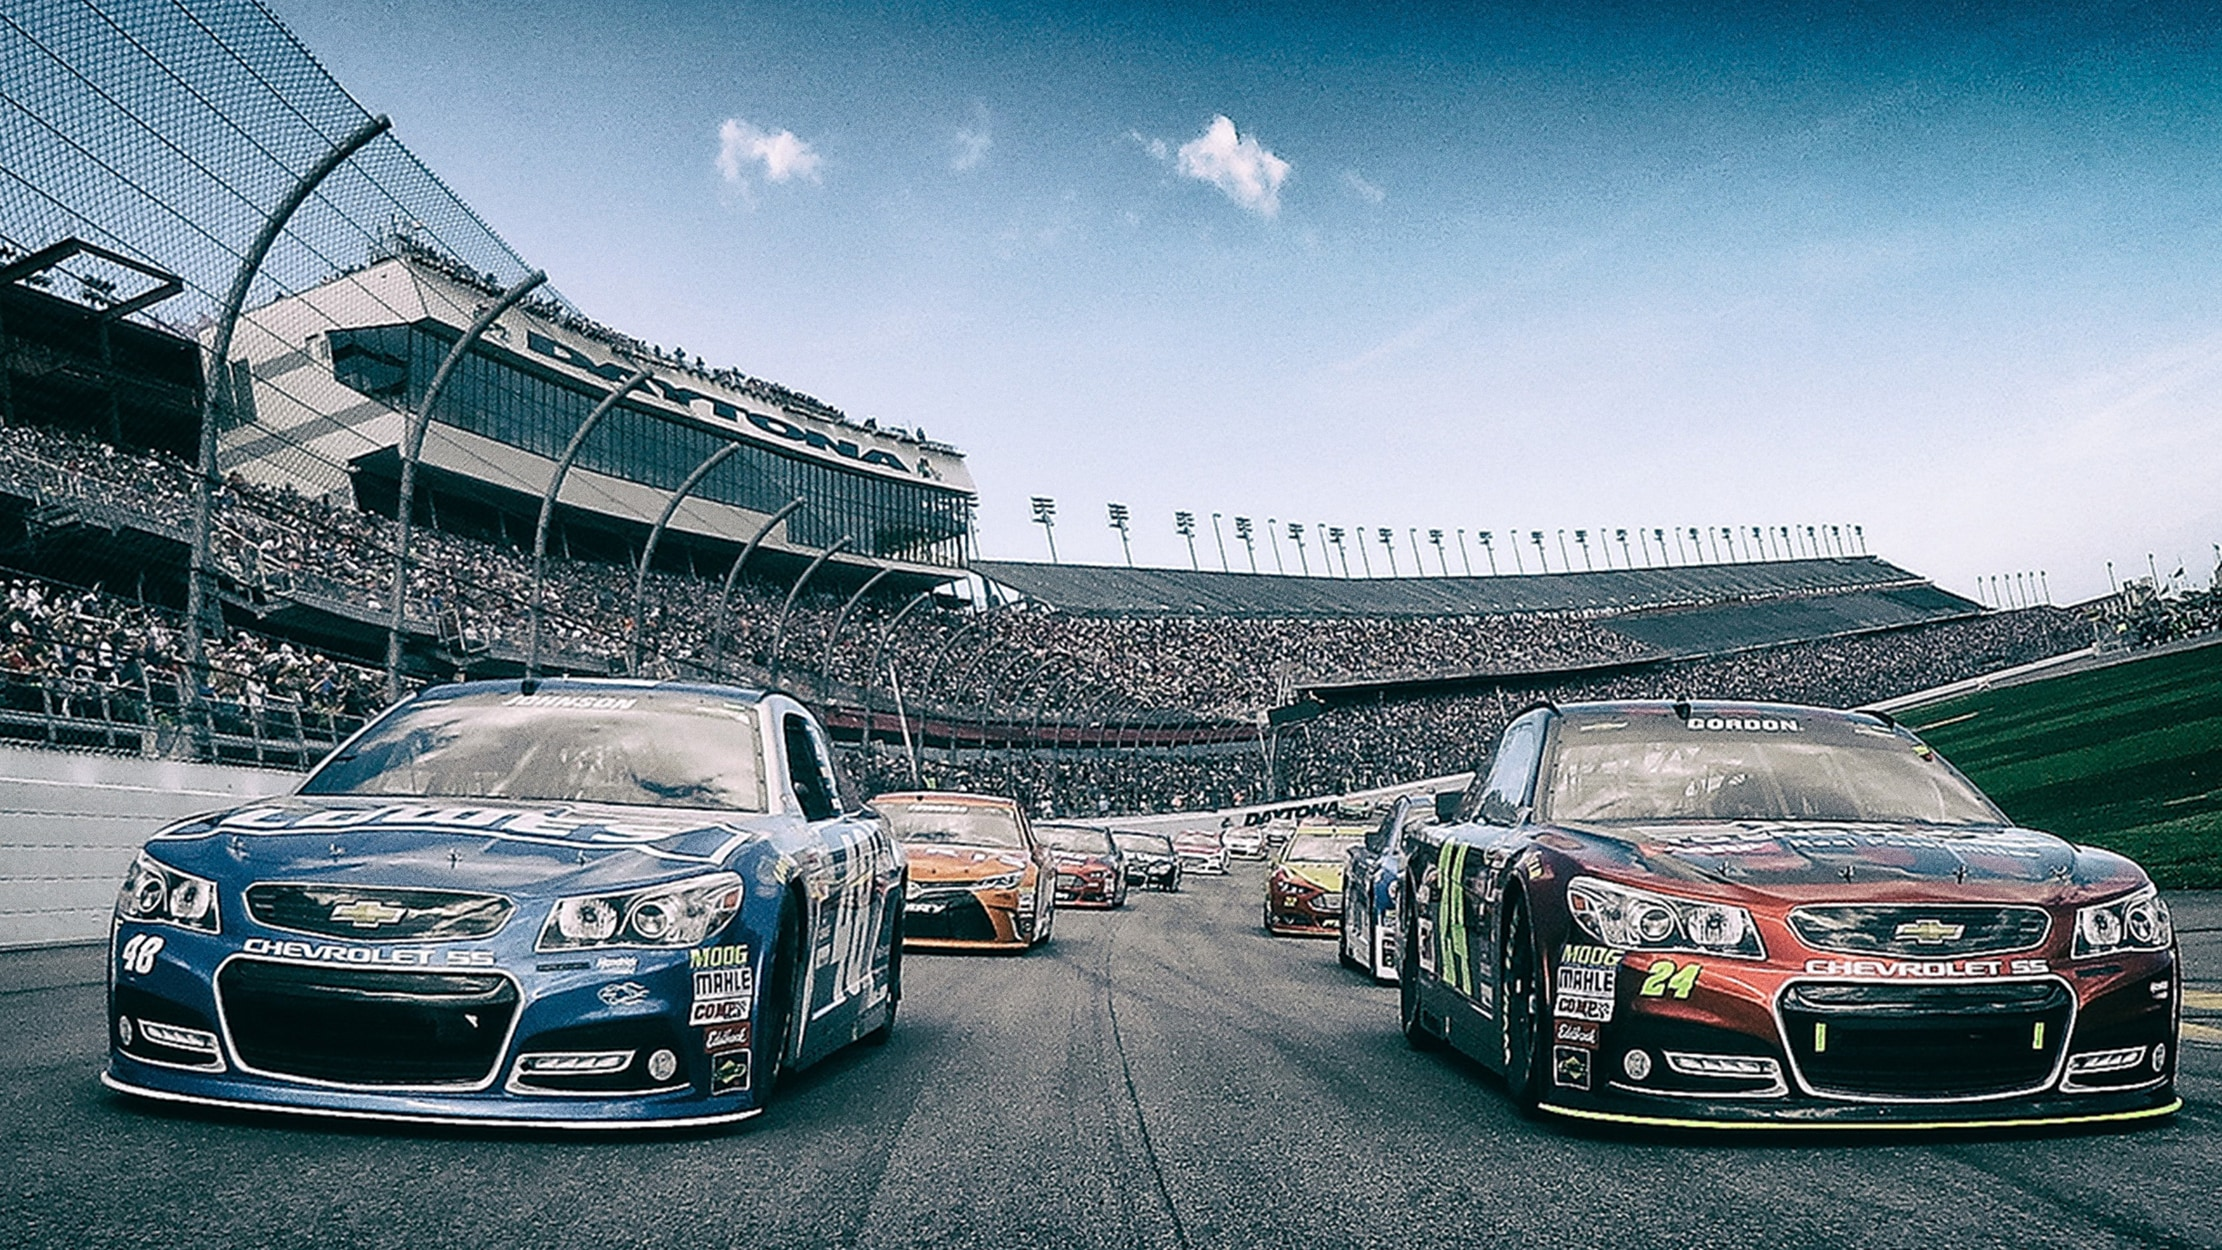 NASCAR Cup Series - Buschy McBusch Race 400 seriesDetail